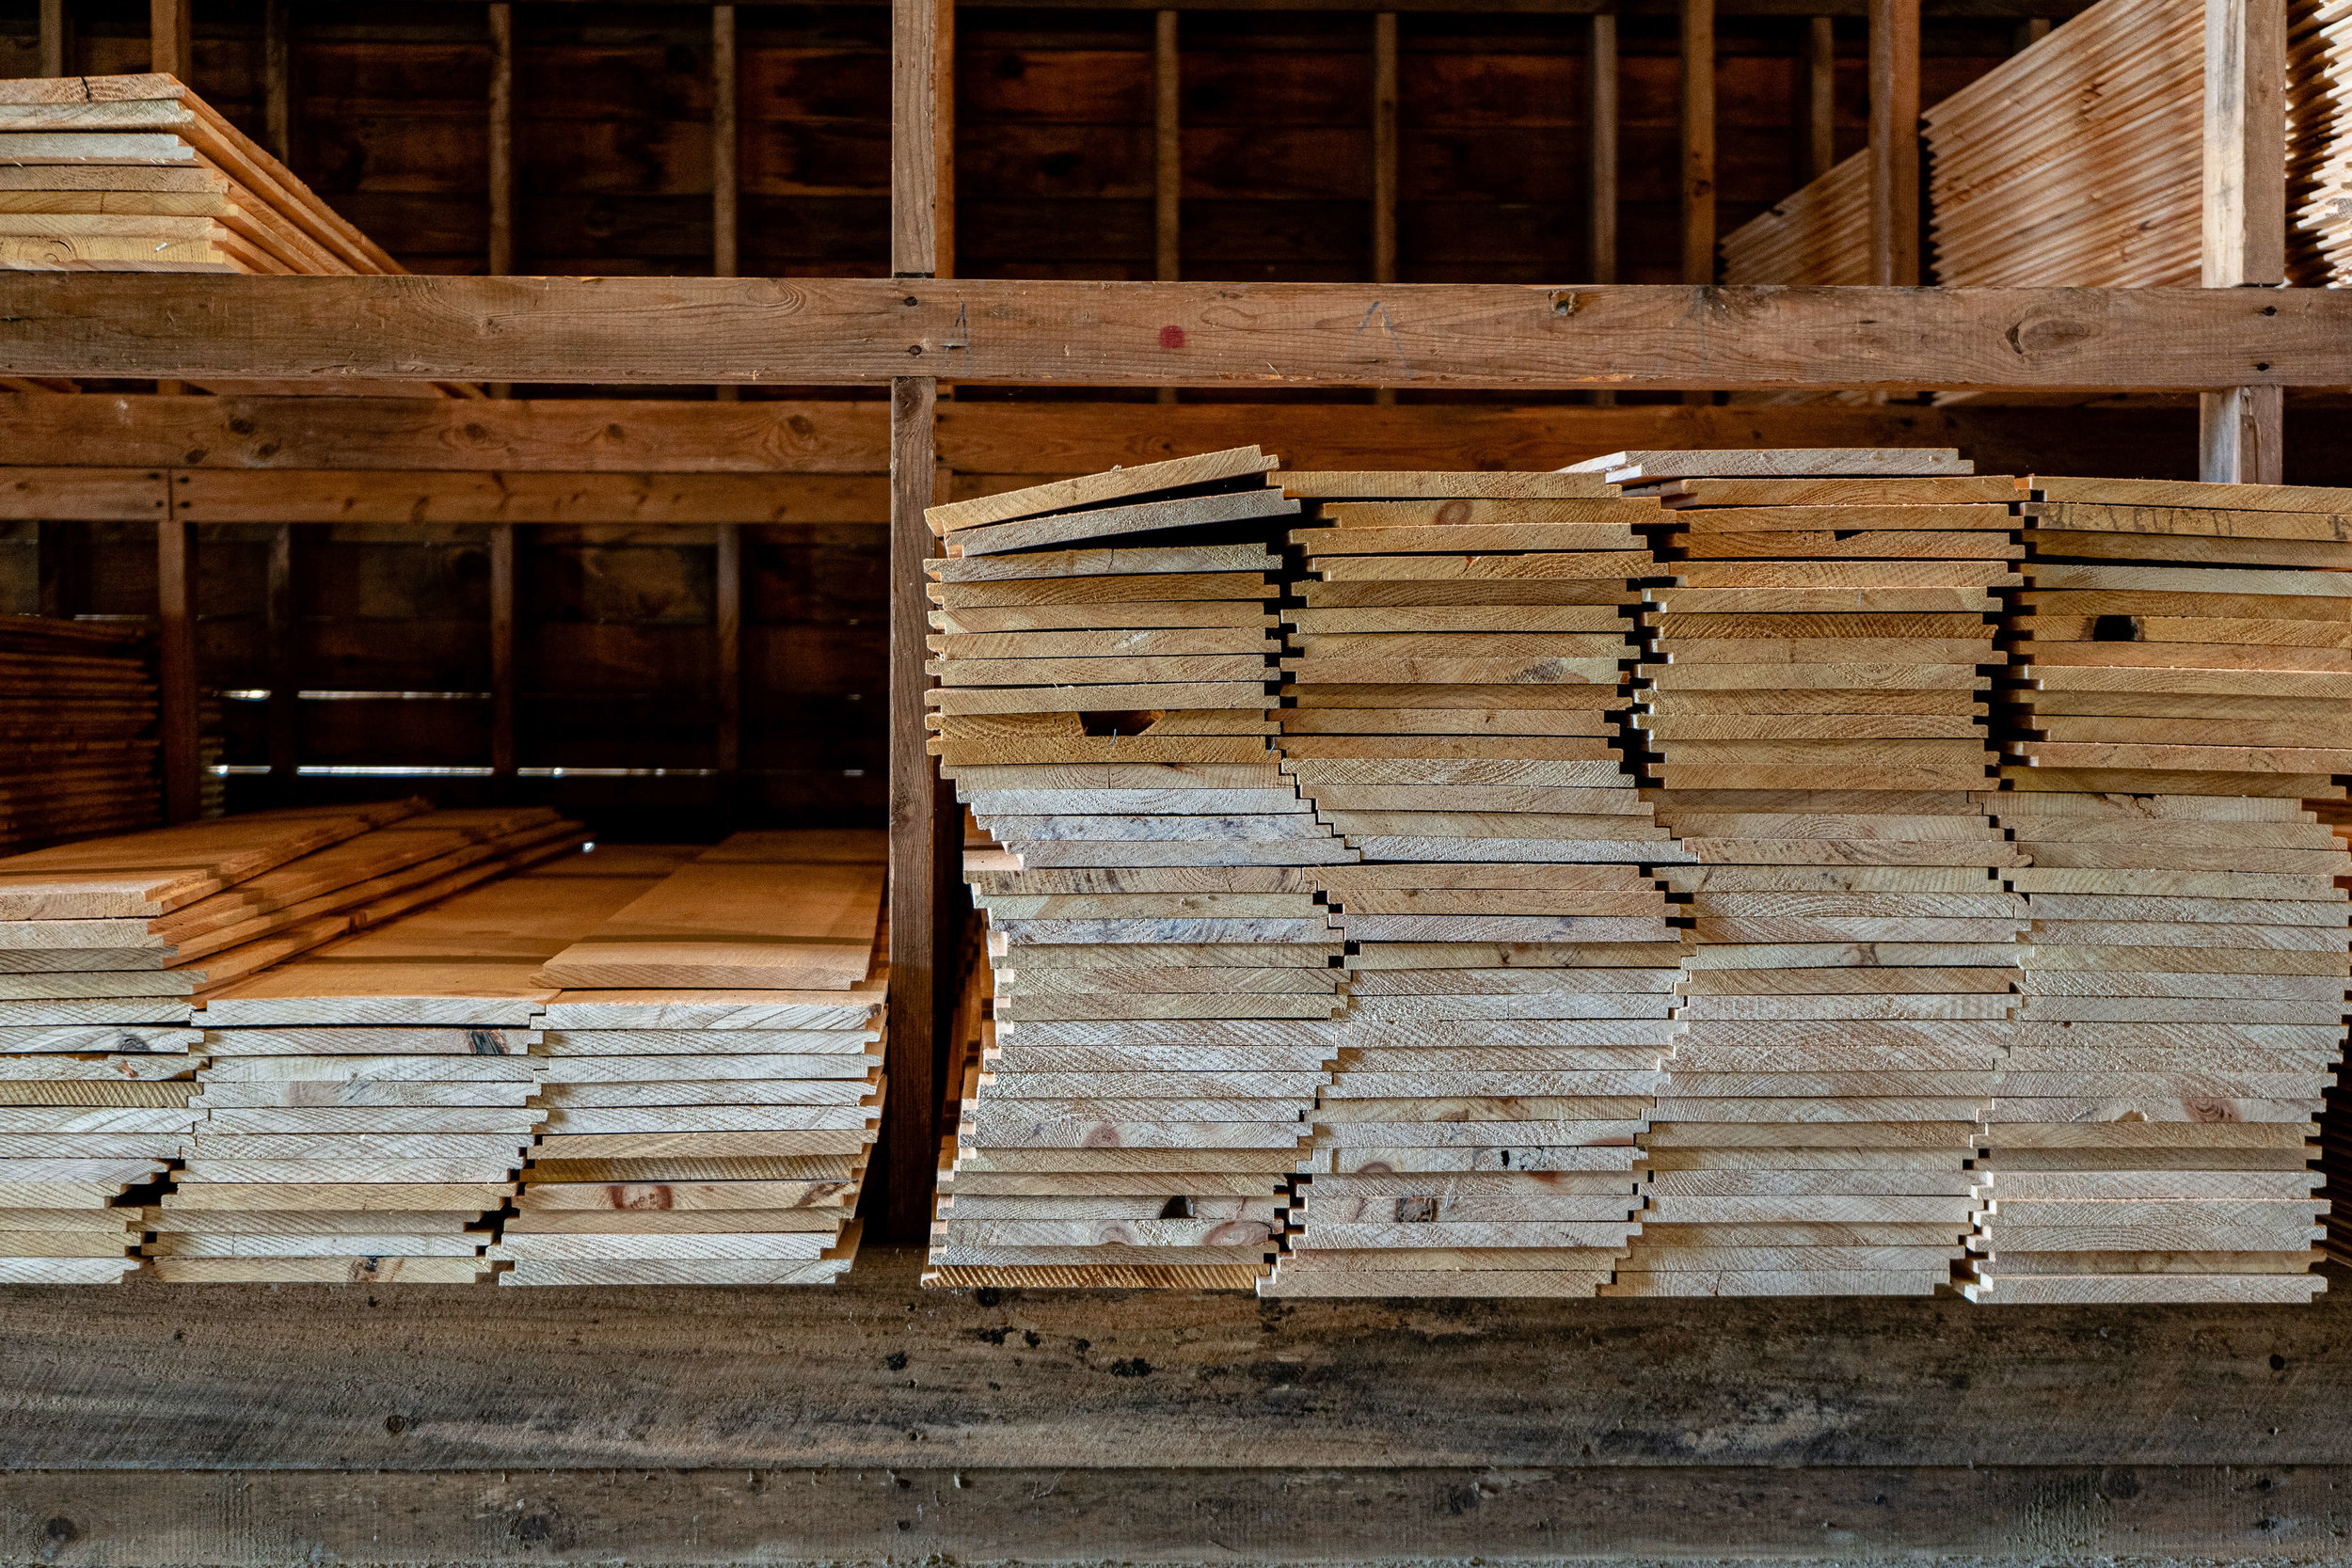 Kiln Dried Pine & Hemlock - We have sawn hemlock and pine in stock.